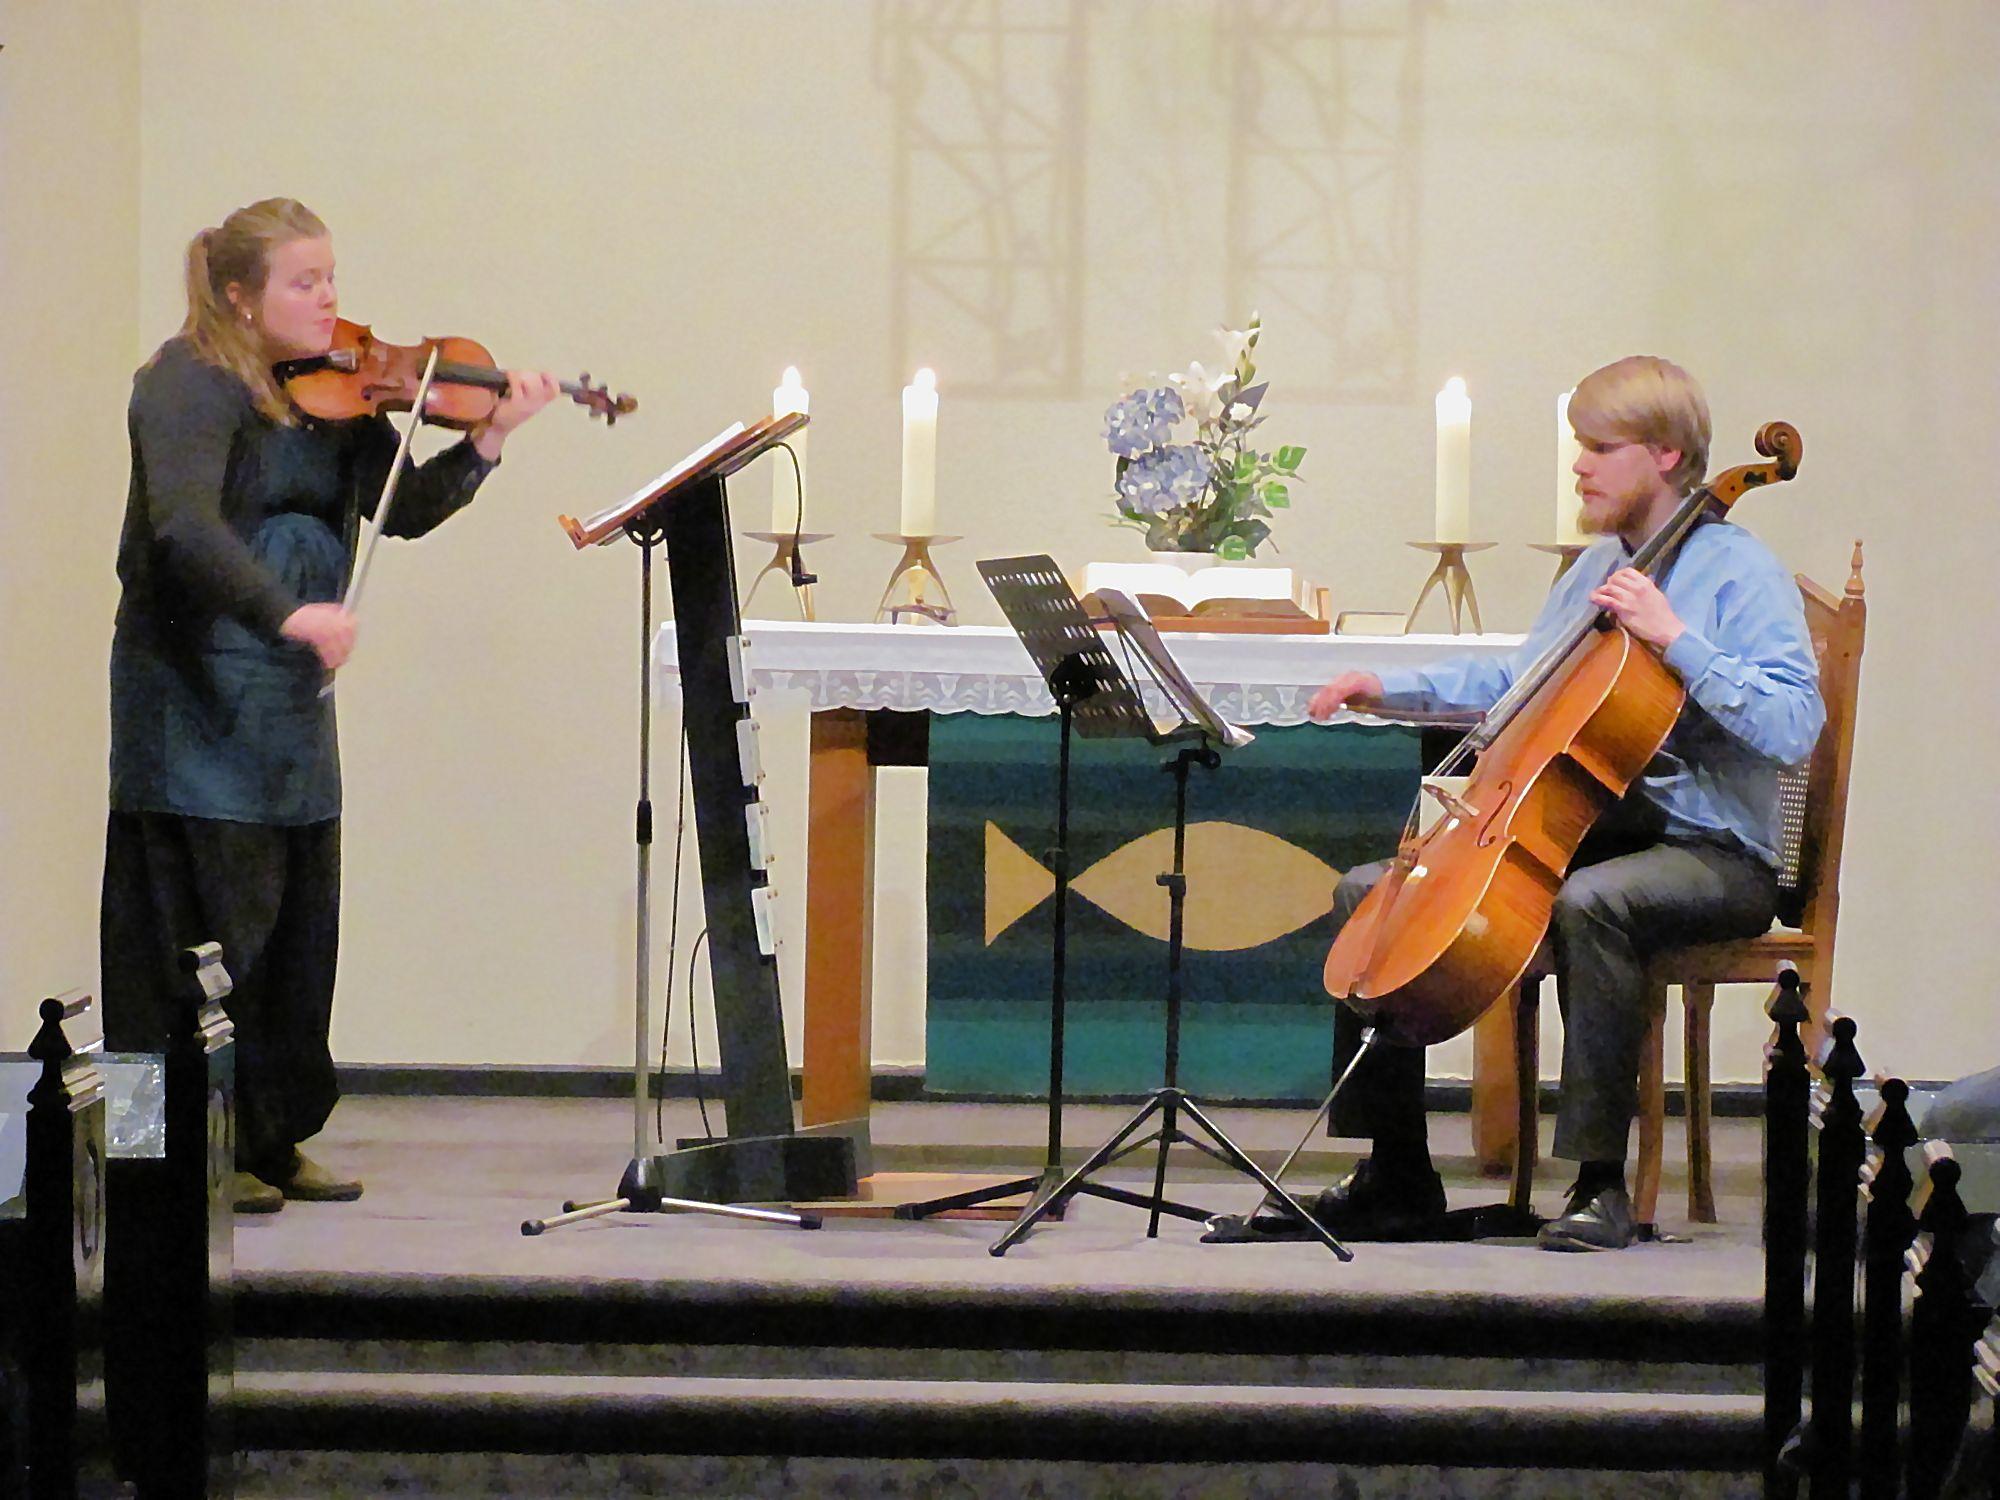 Duo Feu (Soila Häkkinen & Jarkko Launonen)